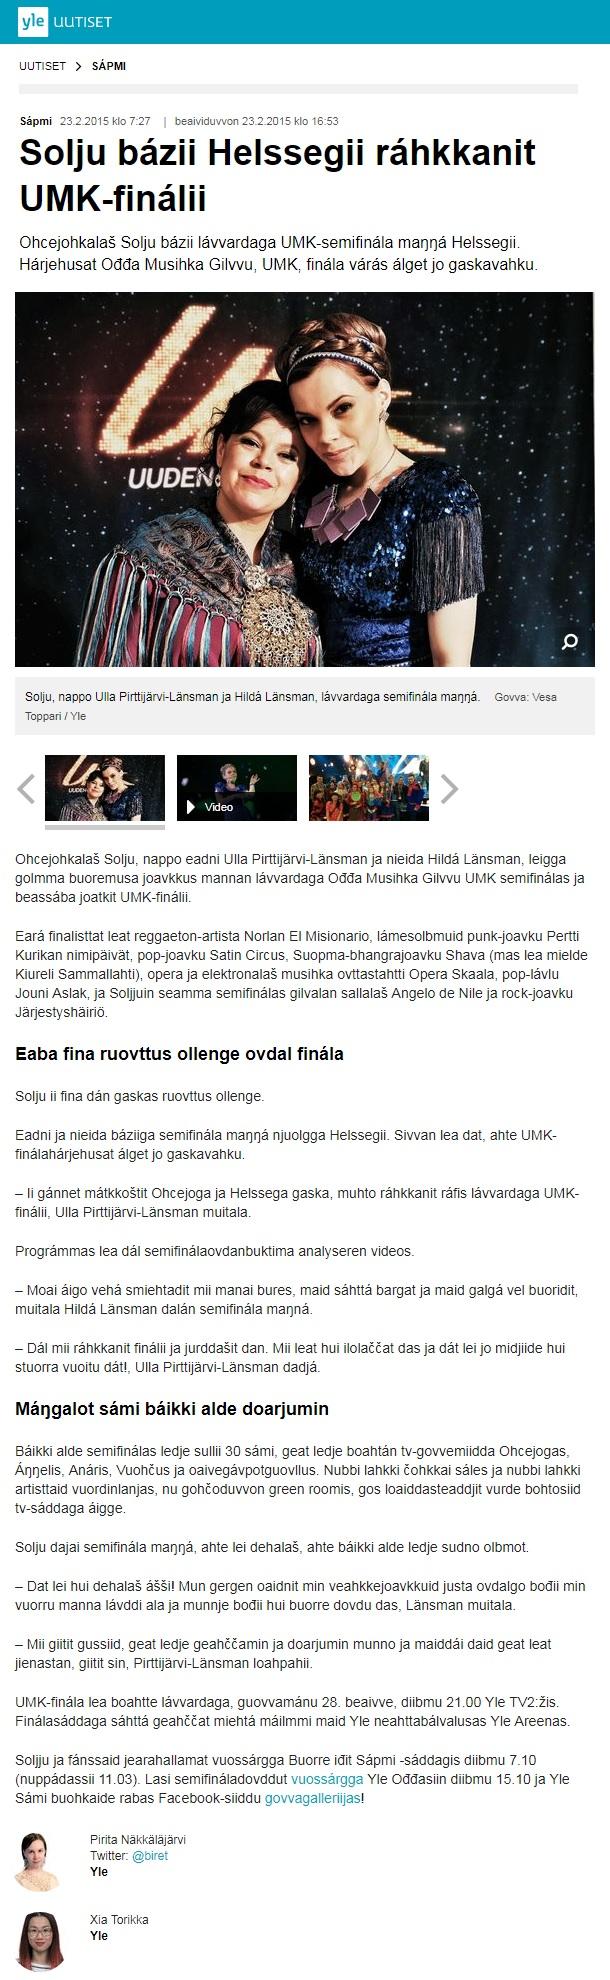 Yle Sápmi, Solju bázii Helssegii ráhkkanit UMK-finálii, (Finland), 23.2.2015